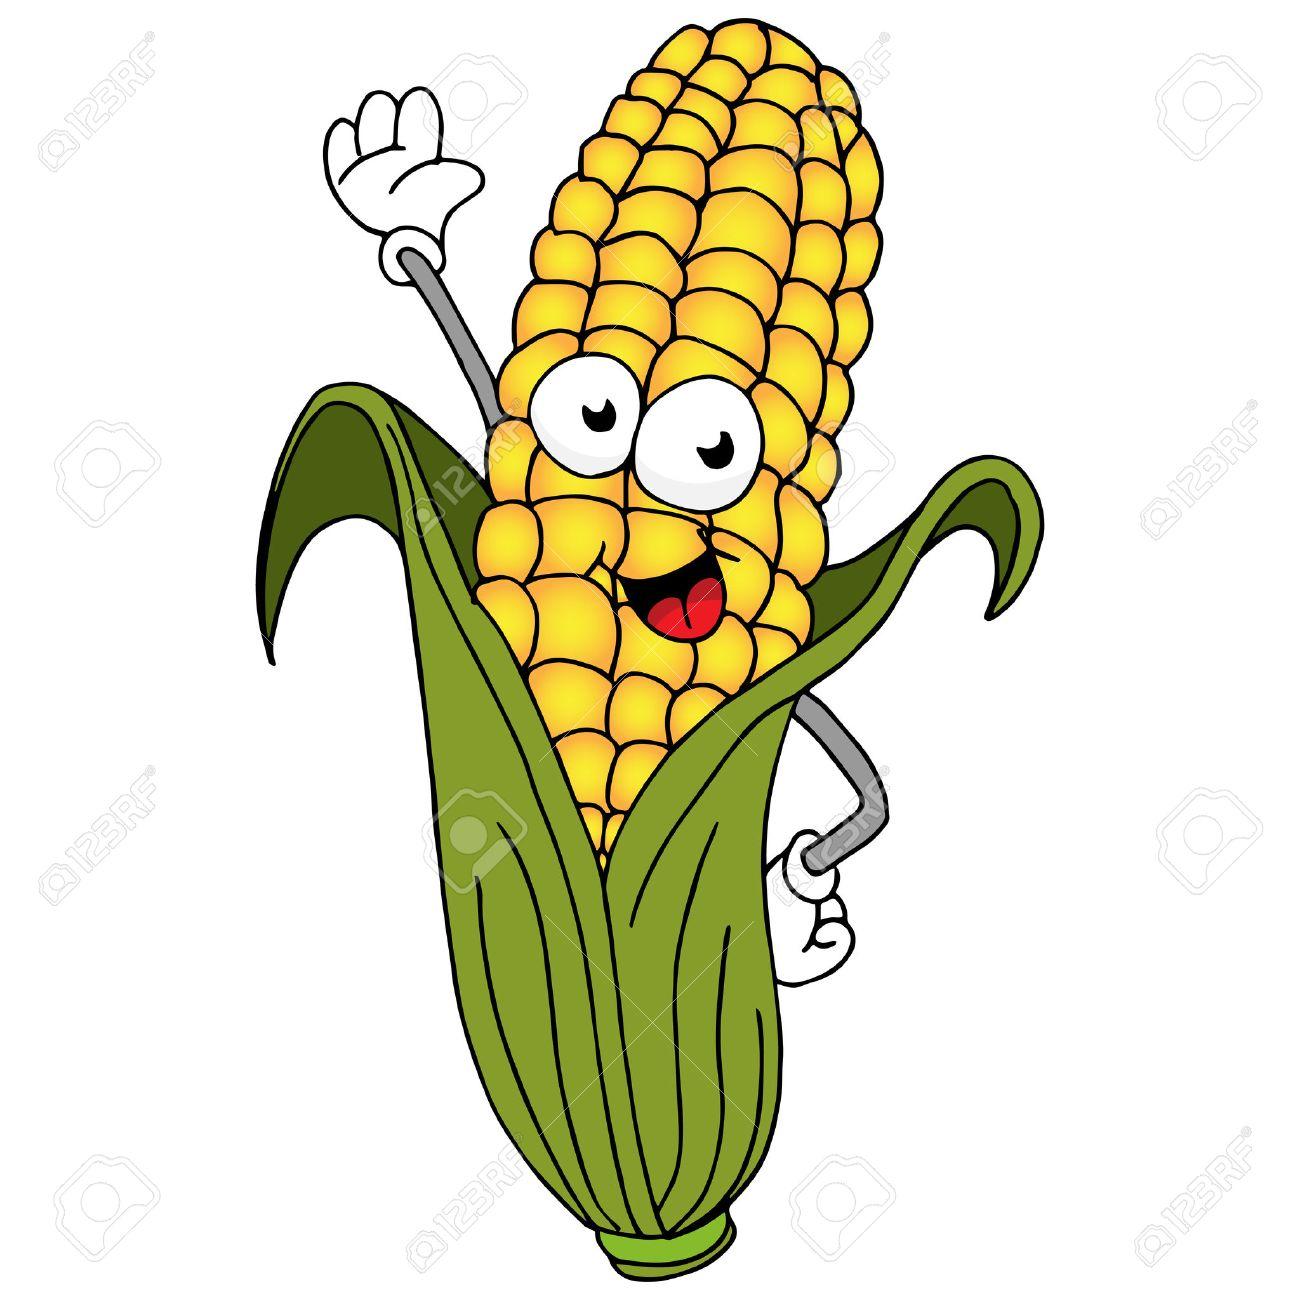 An image of a ear of corn cartoon character..